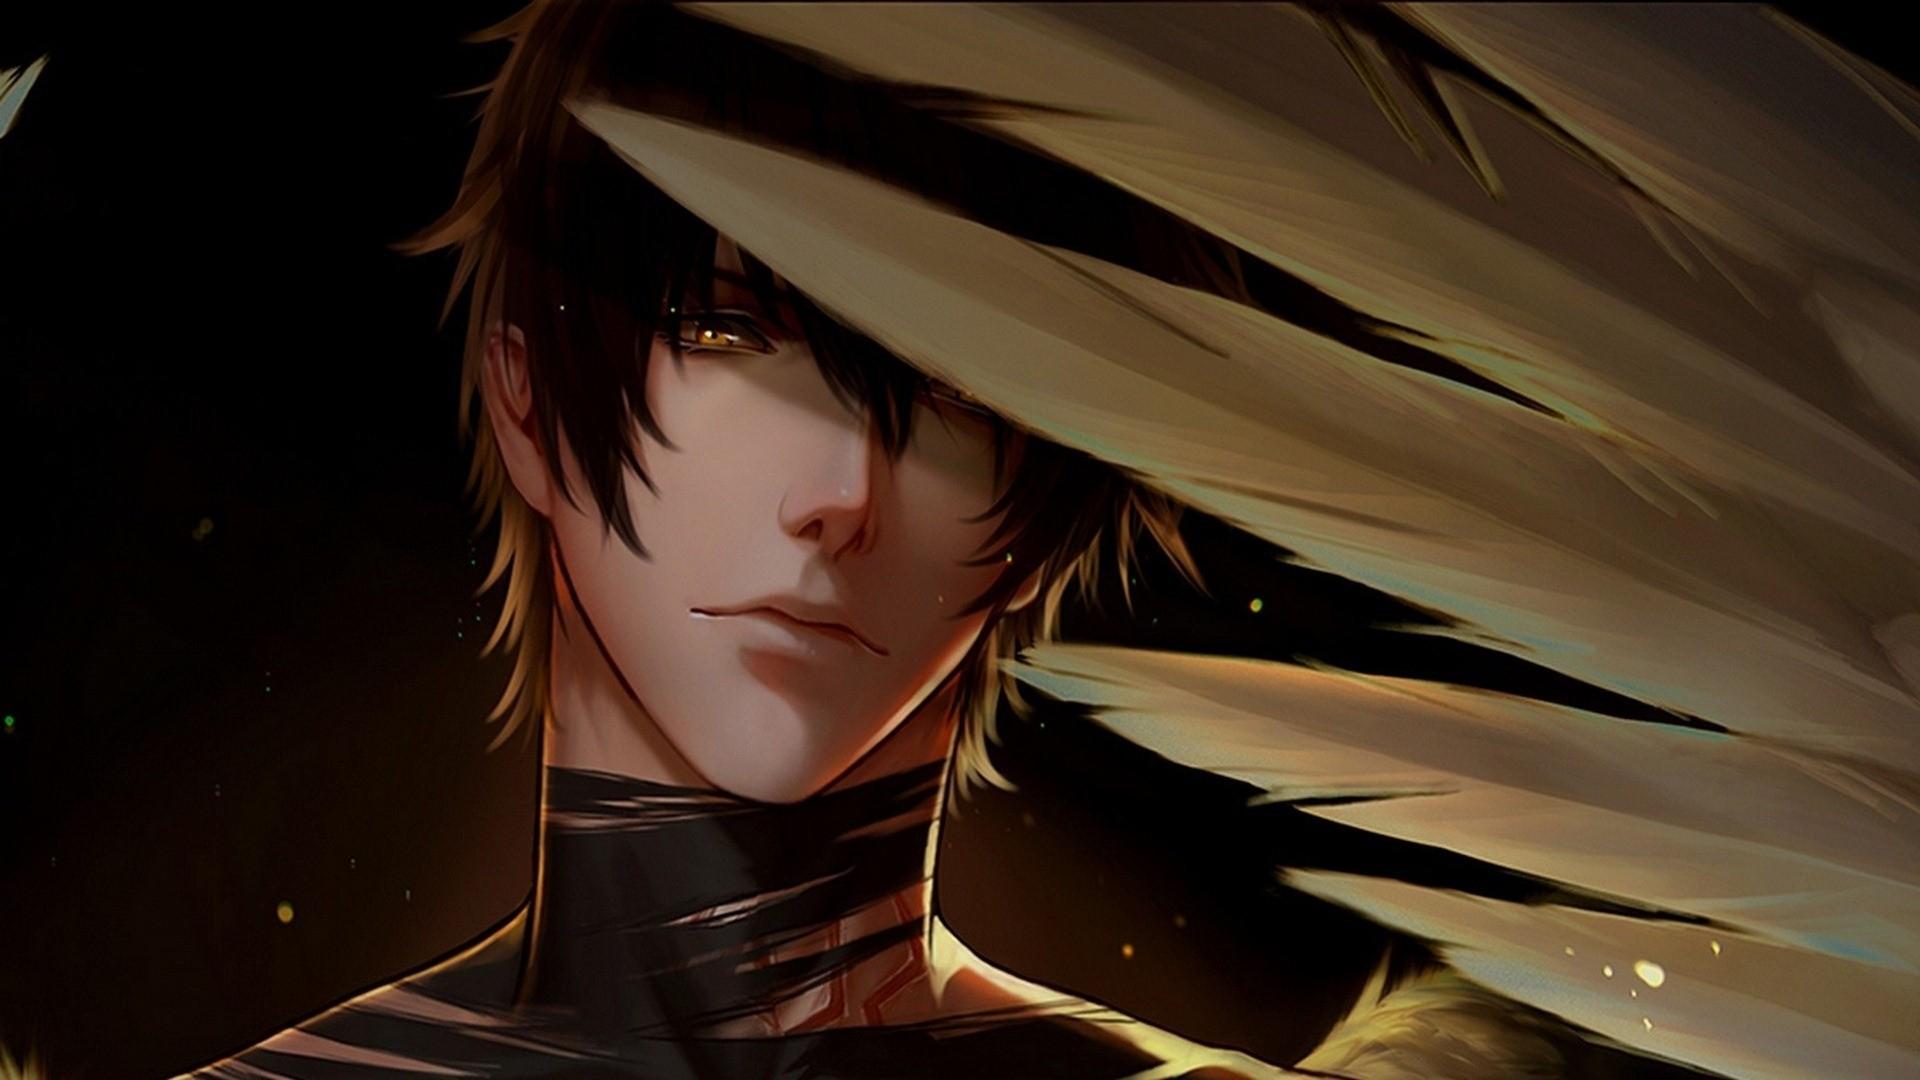 Handsome Anime Boy hd desktop wallpaper